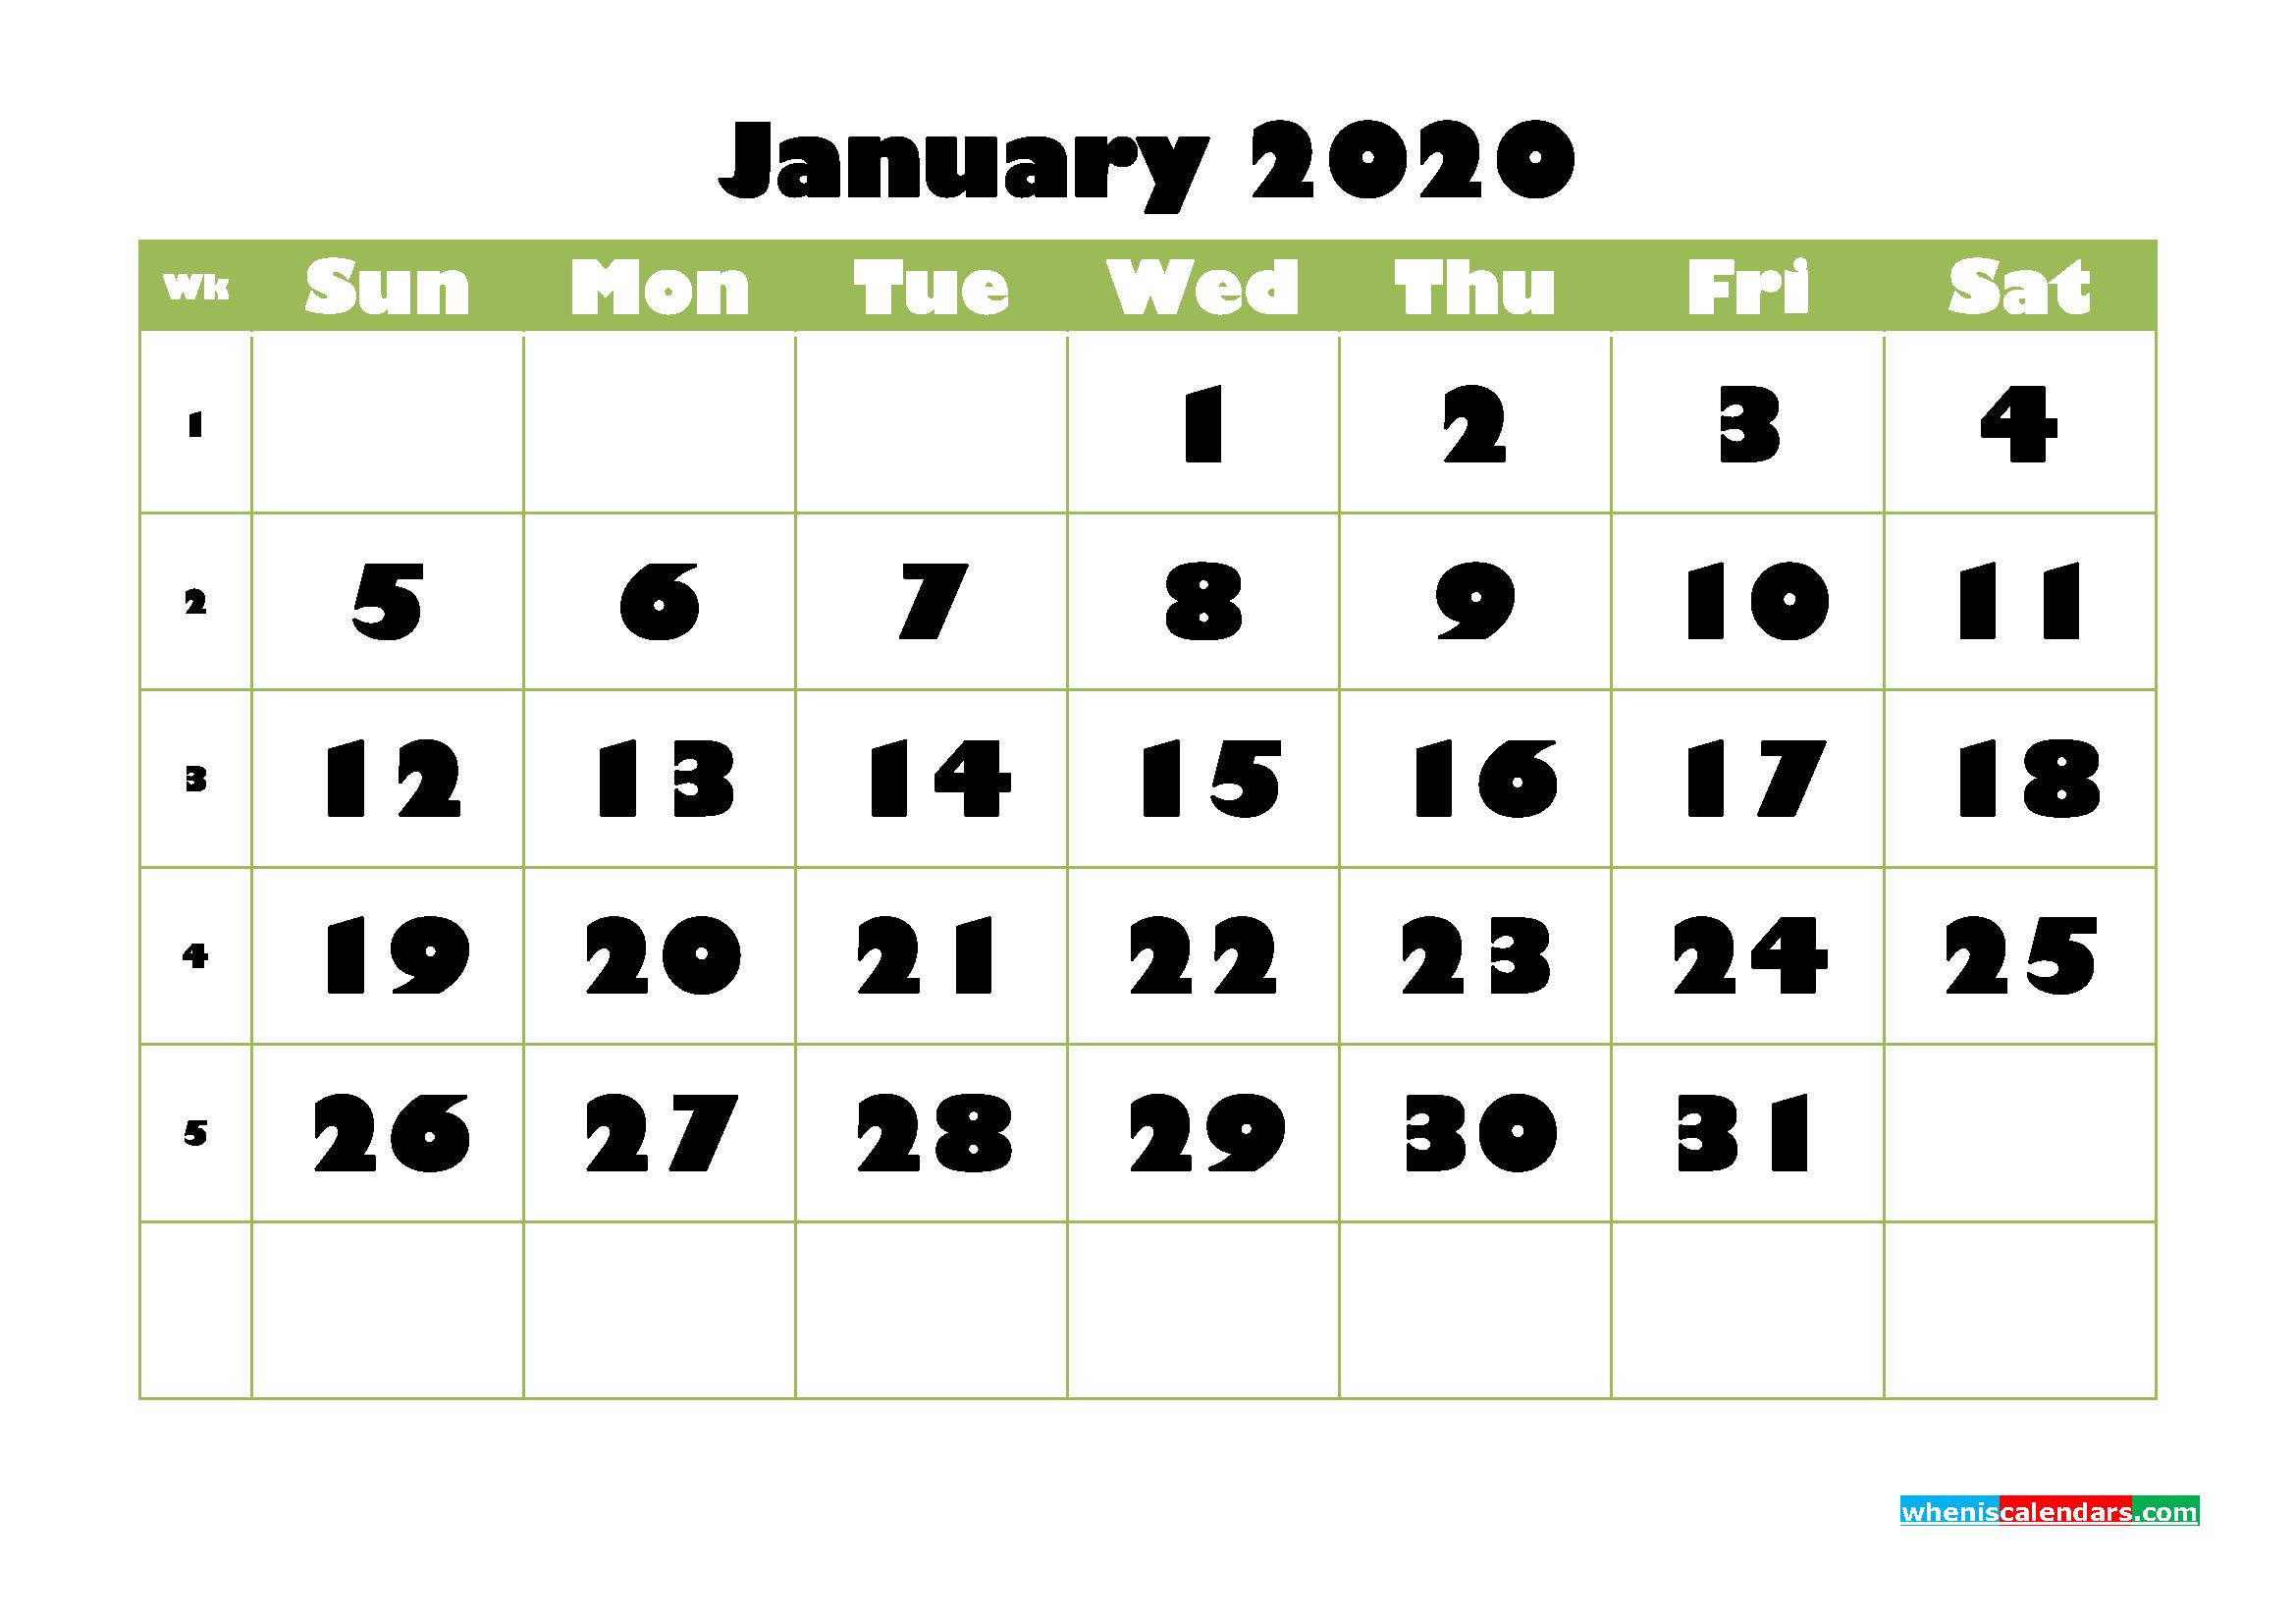 January Printable Calendar 2020 PDF, Word - No.m20b733